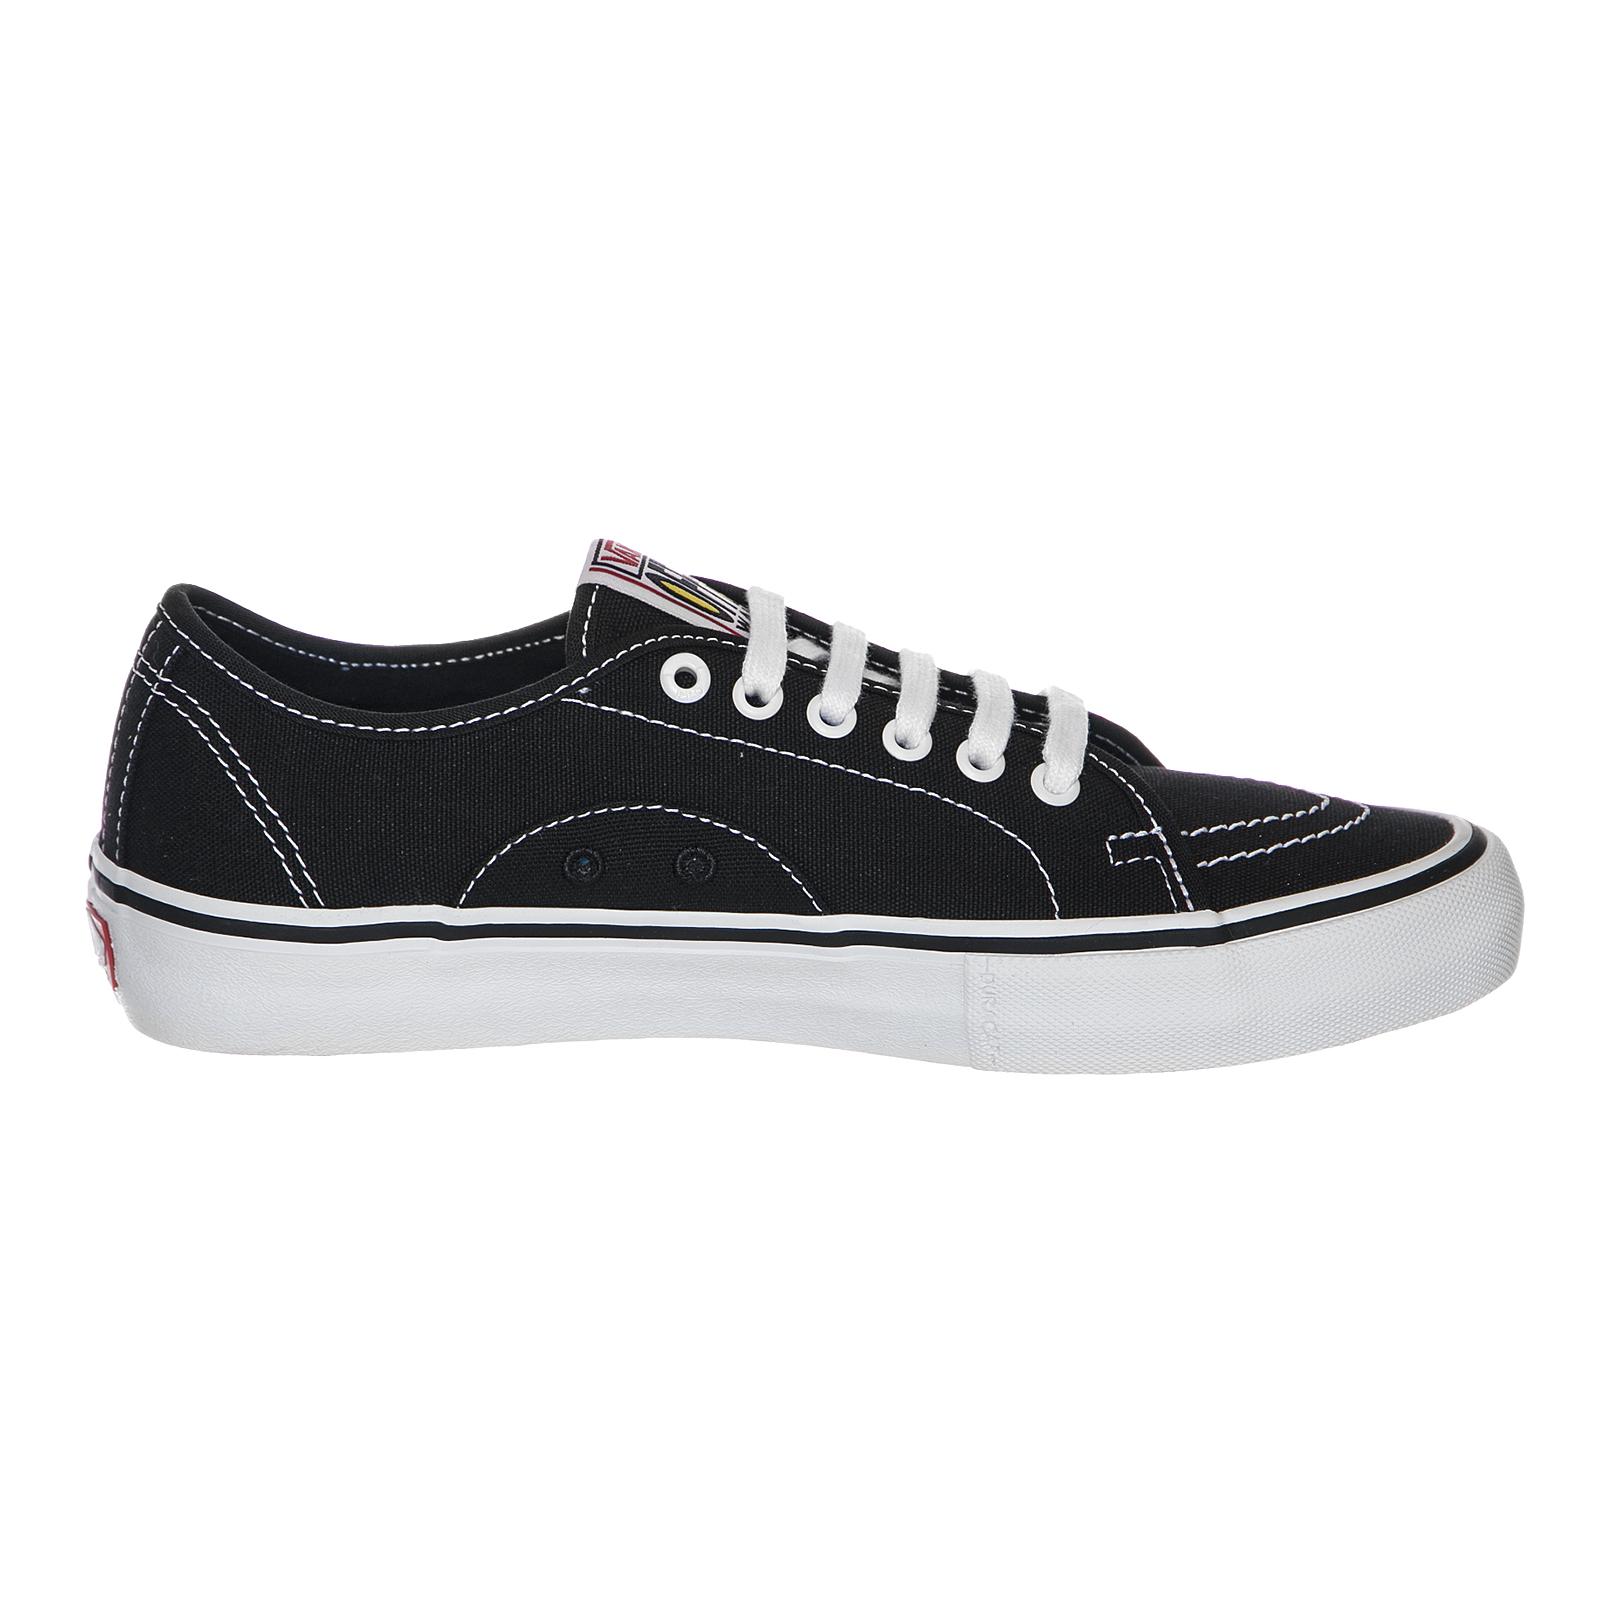 e09f8cc5c8346a Vans Mn Av Classic Pro (Rubber) Black black Us 8.5